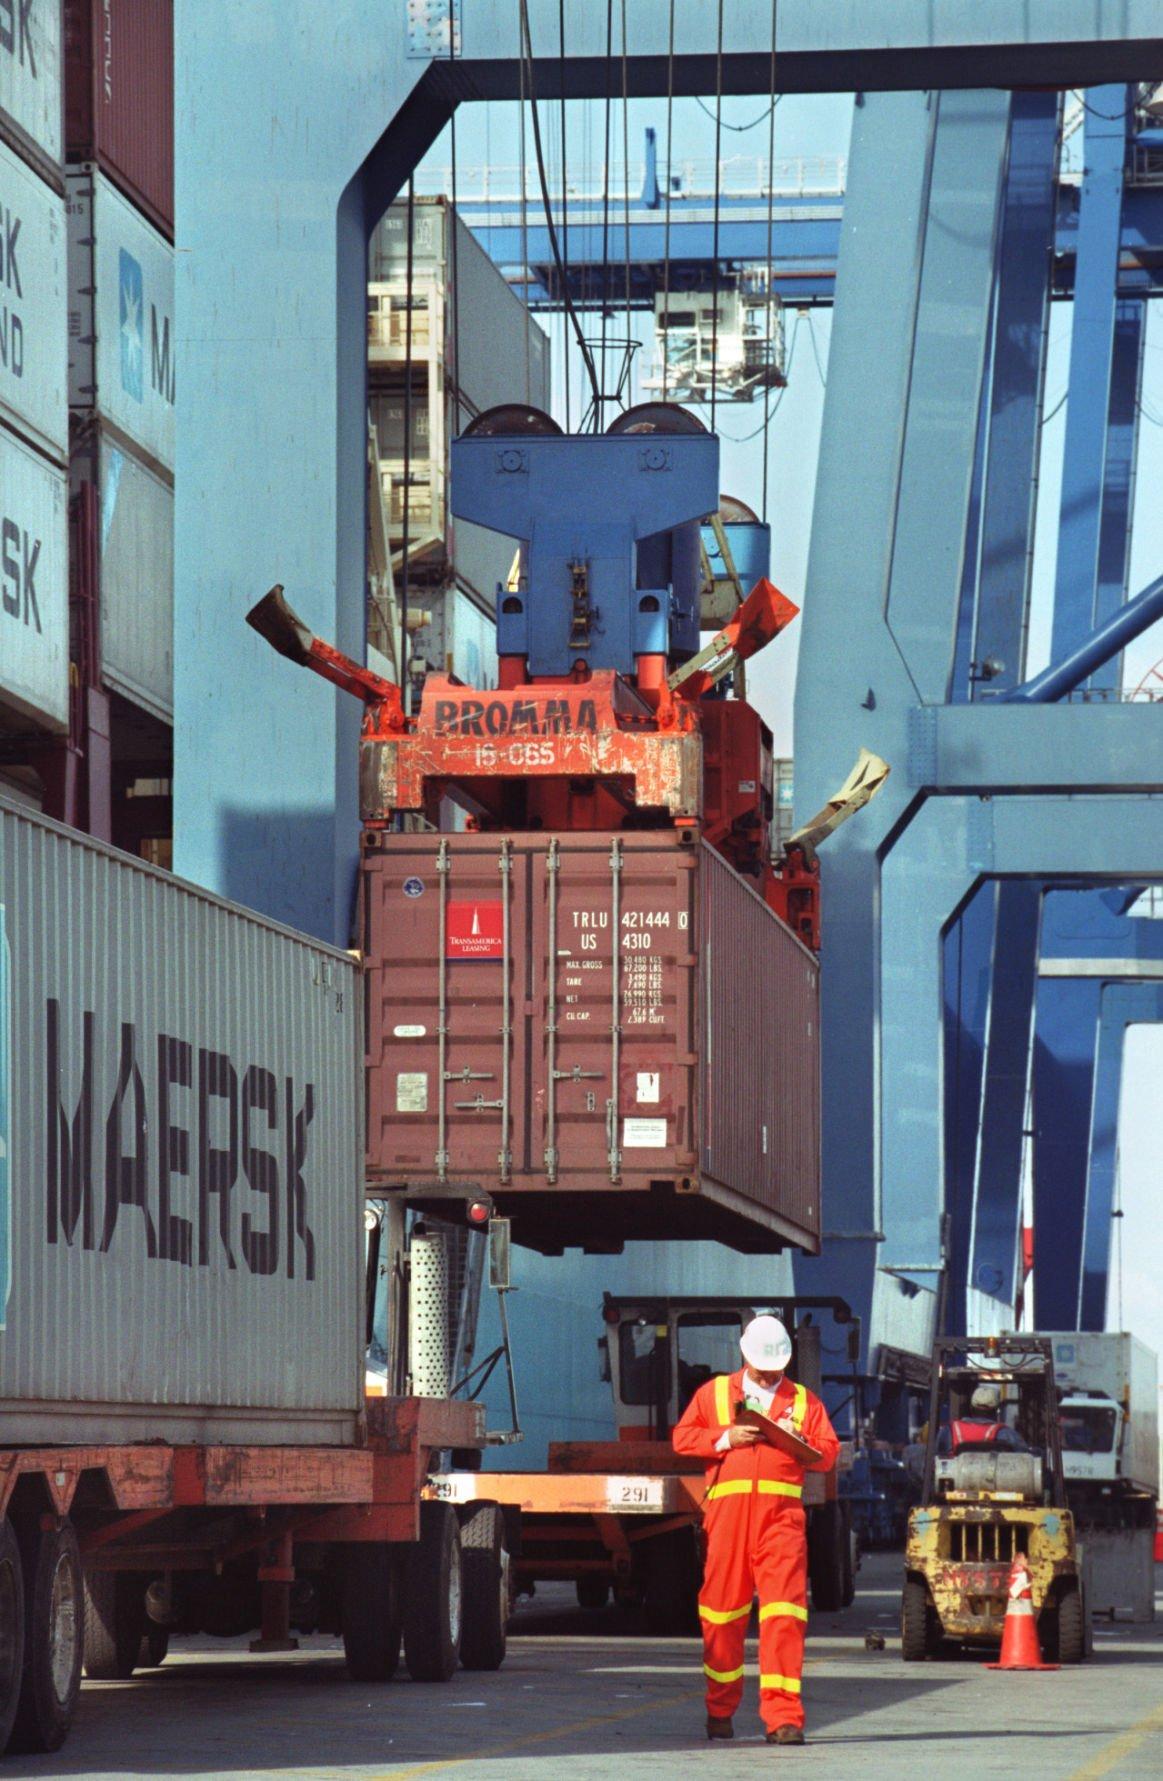 Budget alarm bells ringing for some at South Carolina's ports agency